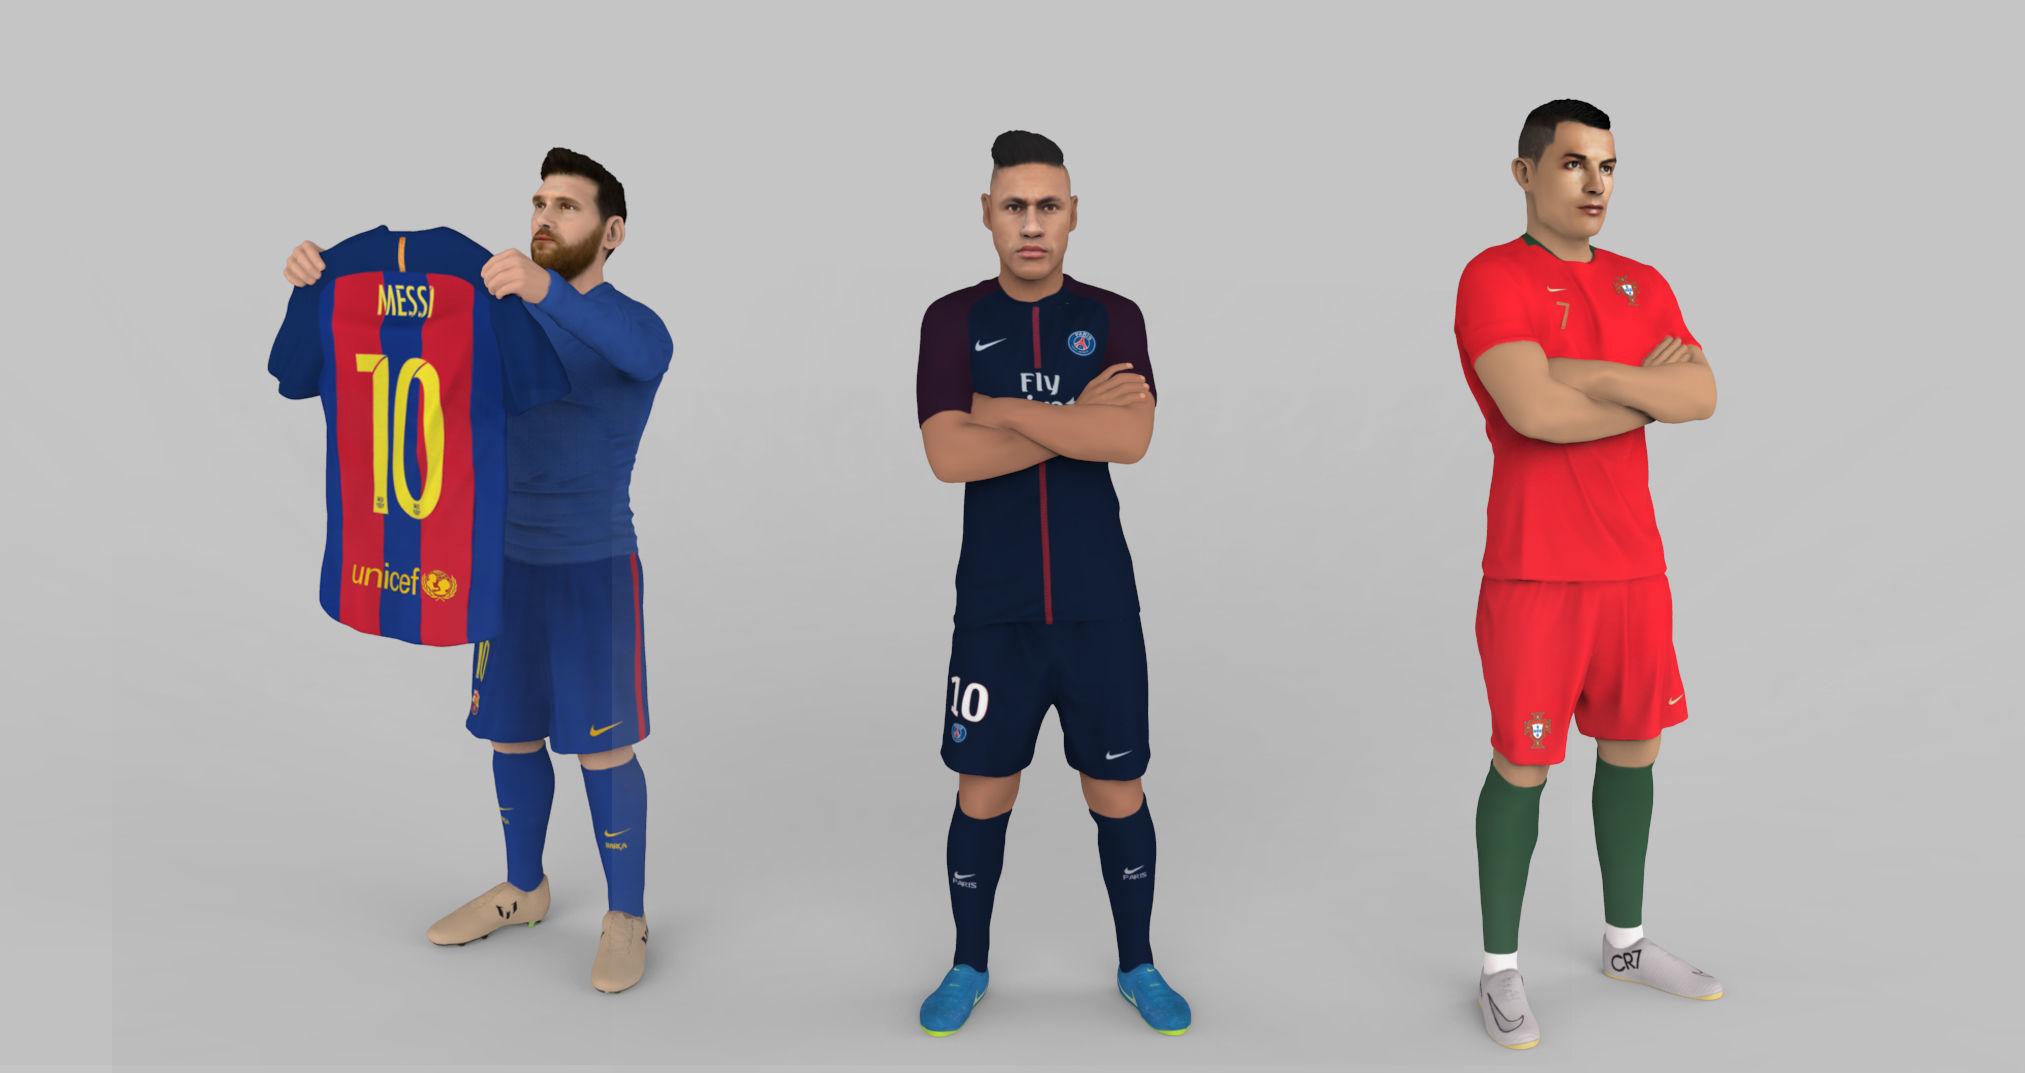 Messi Ronaldo Neymar pack ready for full color 3D printing